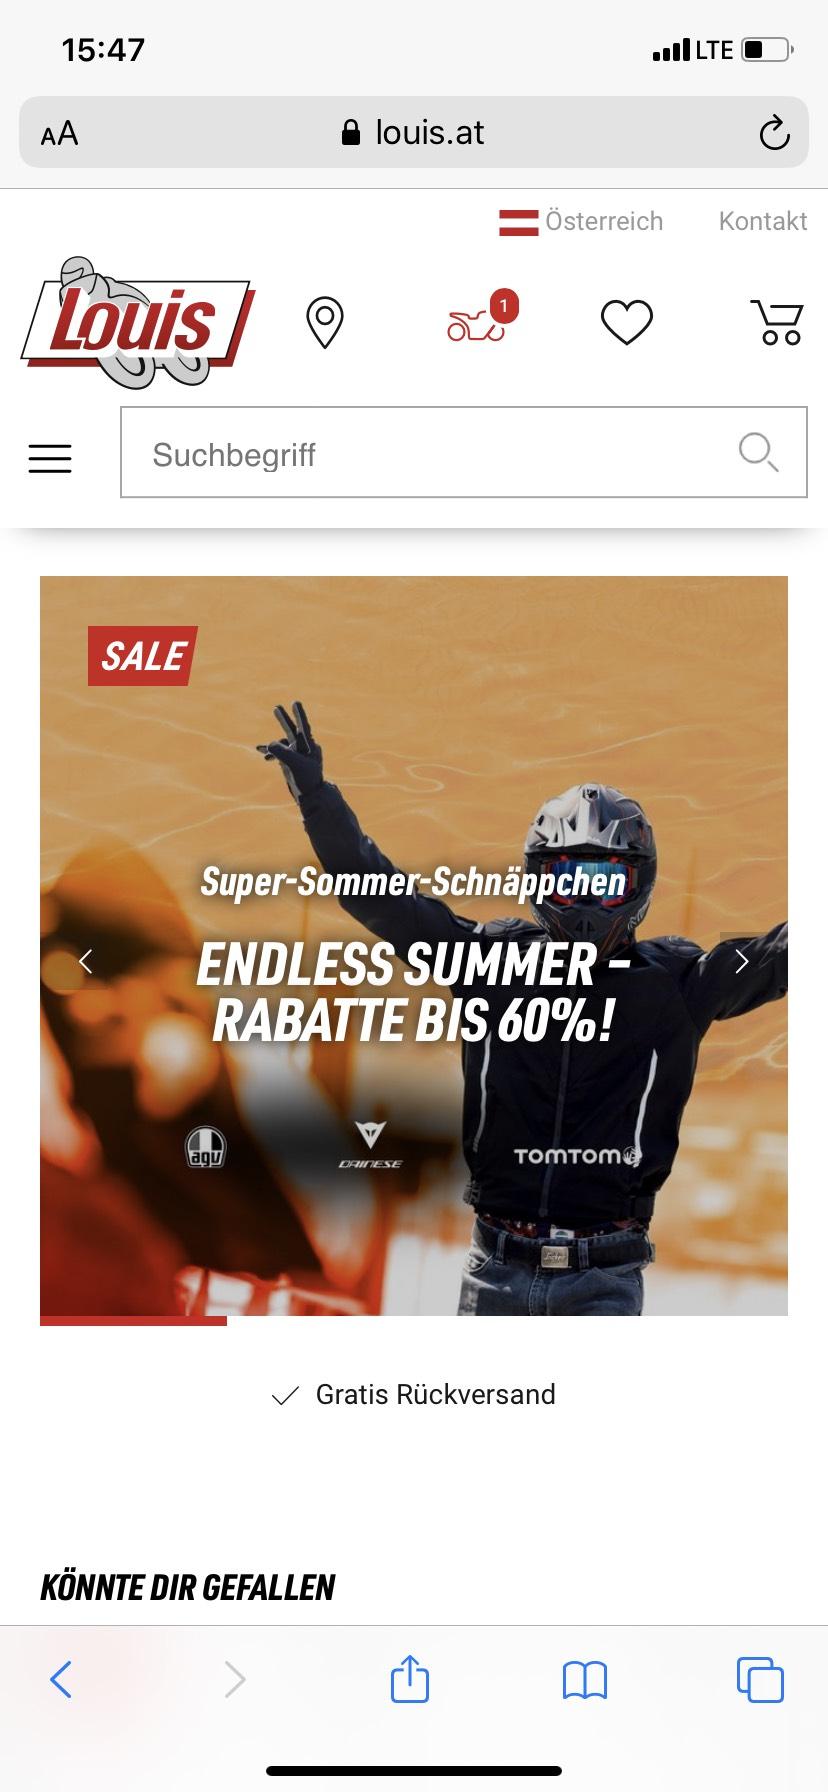 Louis Motorrad - Endless Summer Rabatte